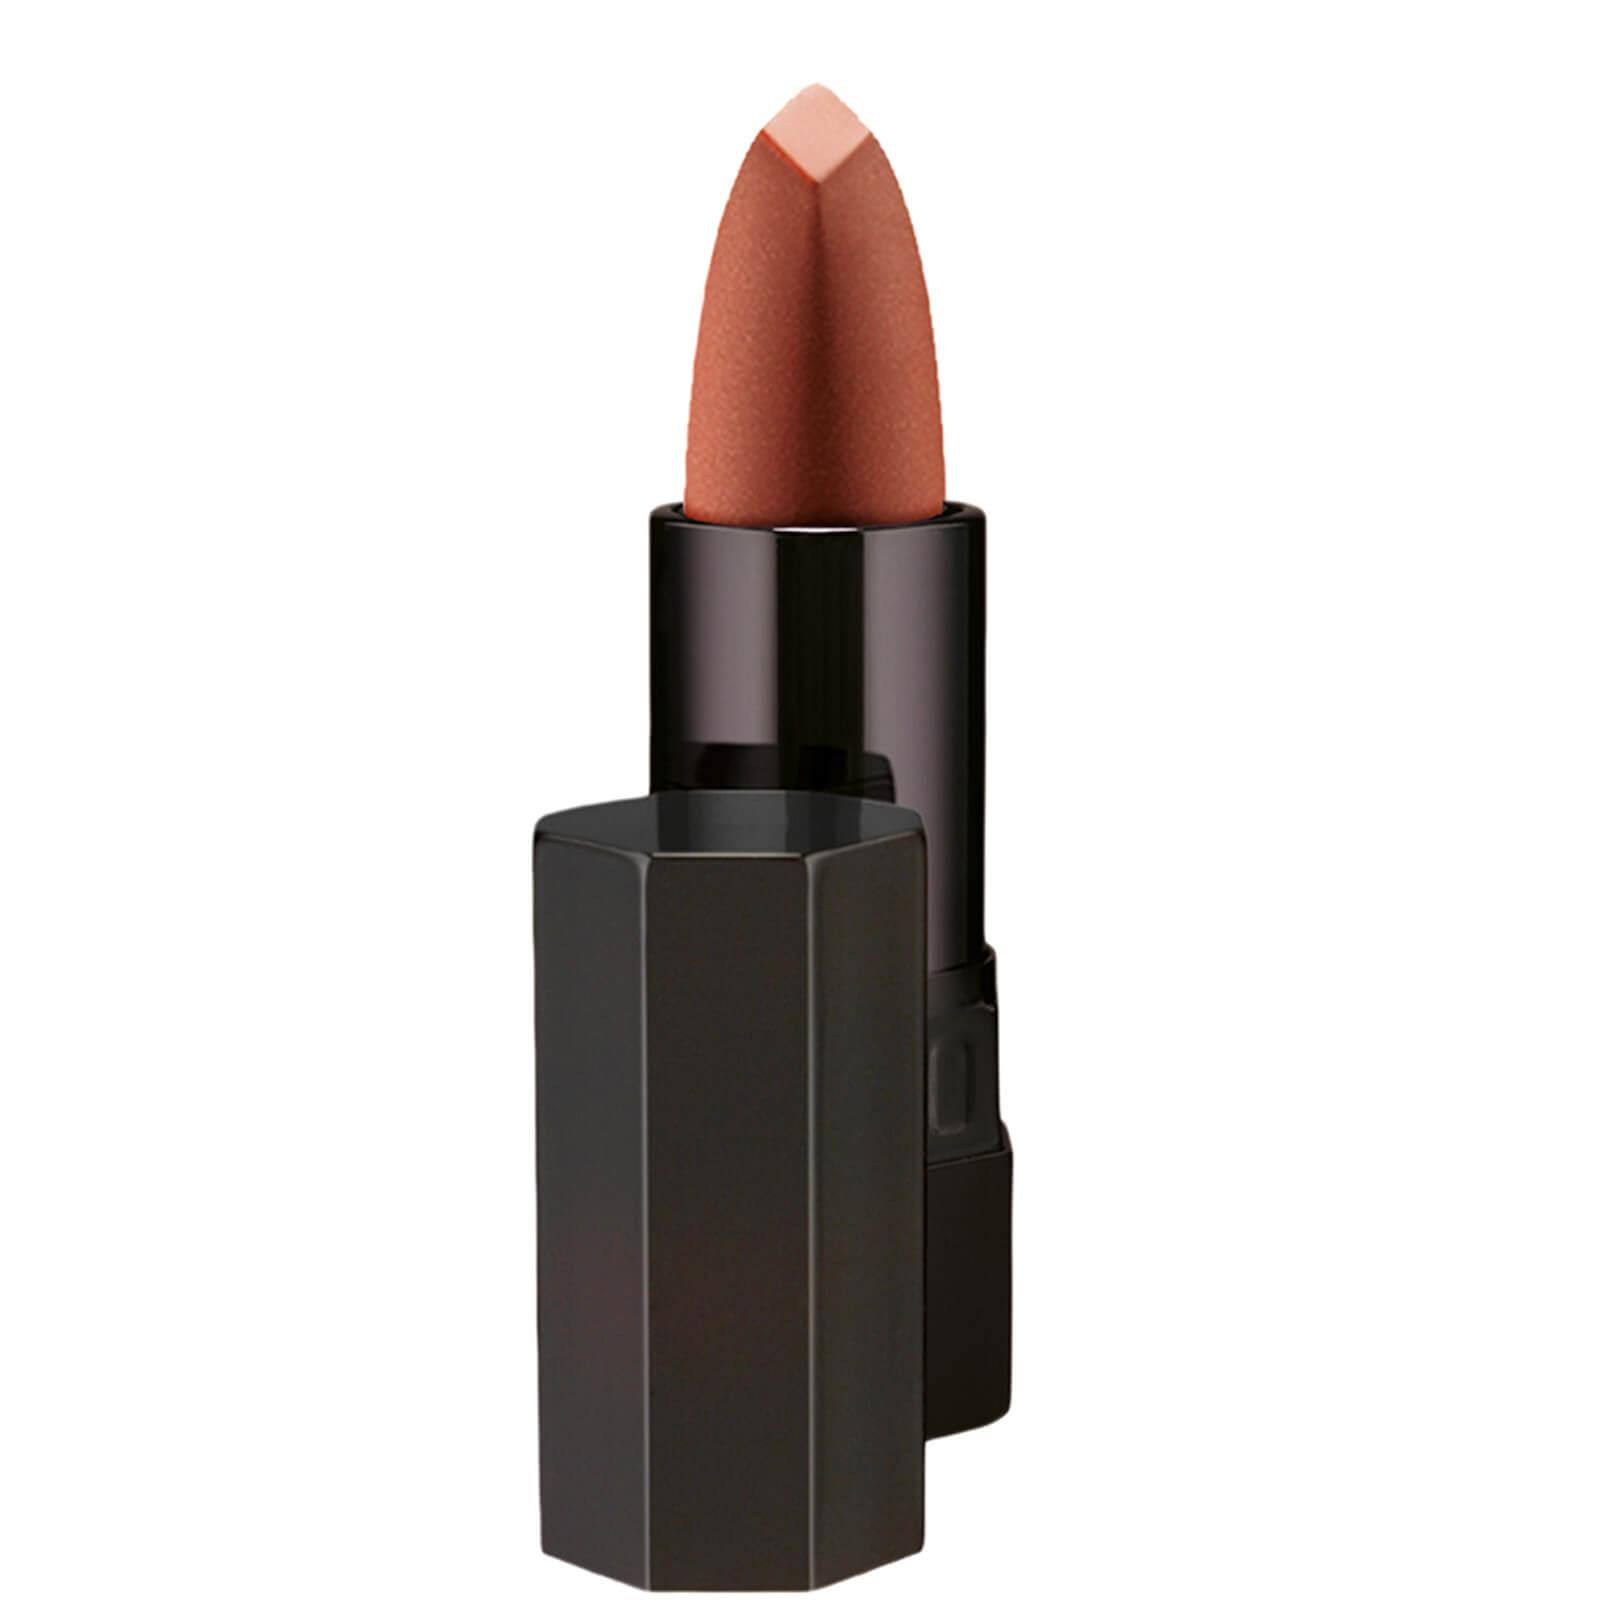 Serge Lutens Lipstick Fard à Lèvres 2.3g (Various Shades) - N°28 Compliment Beige